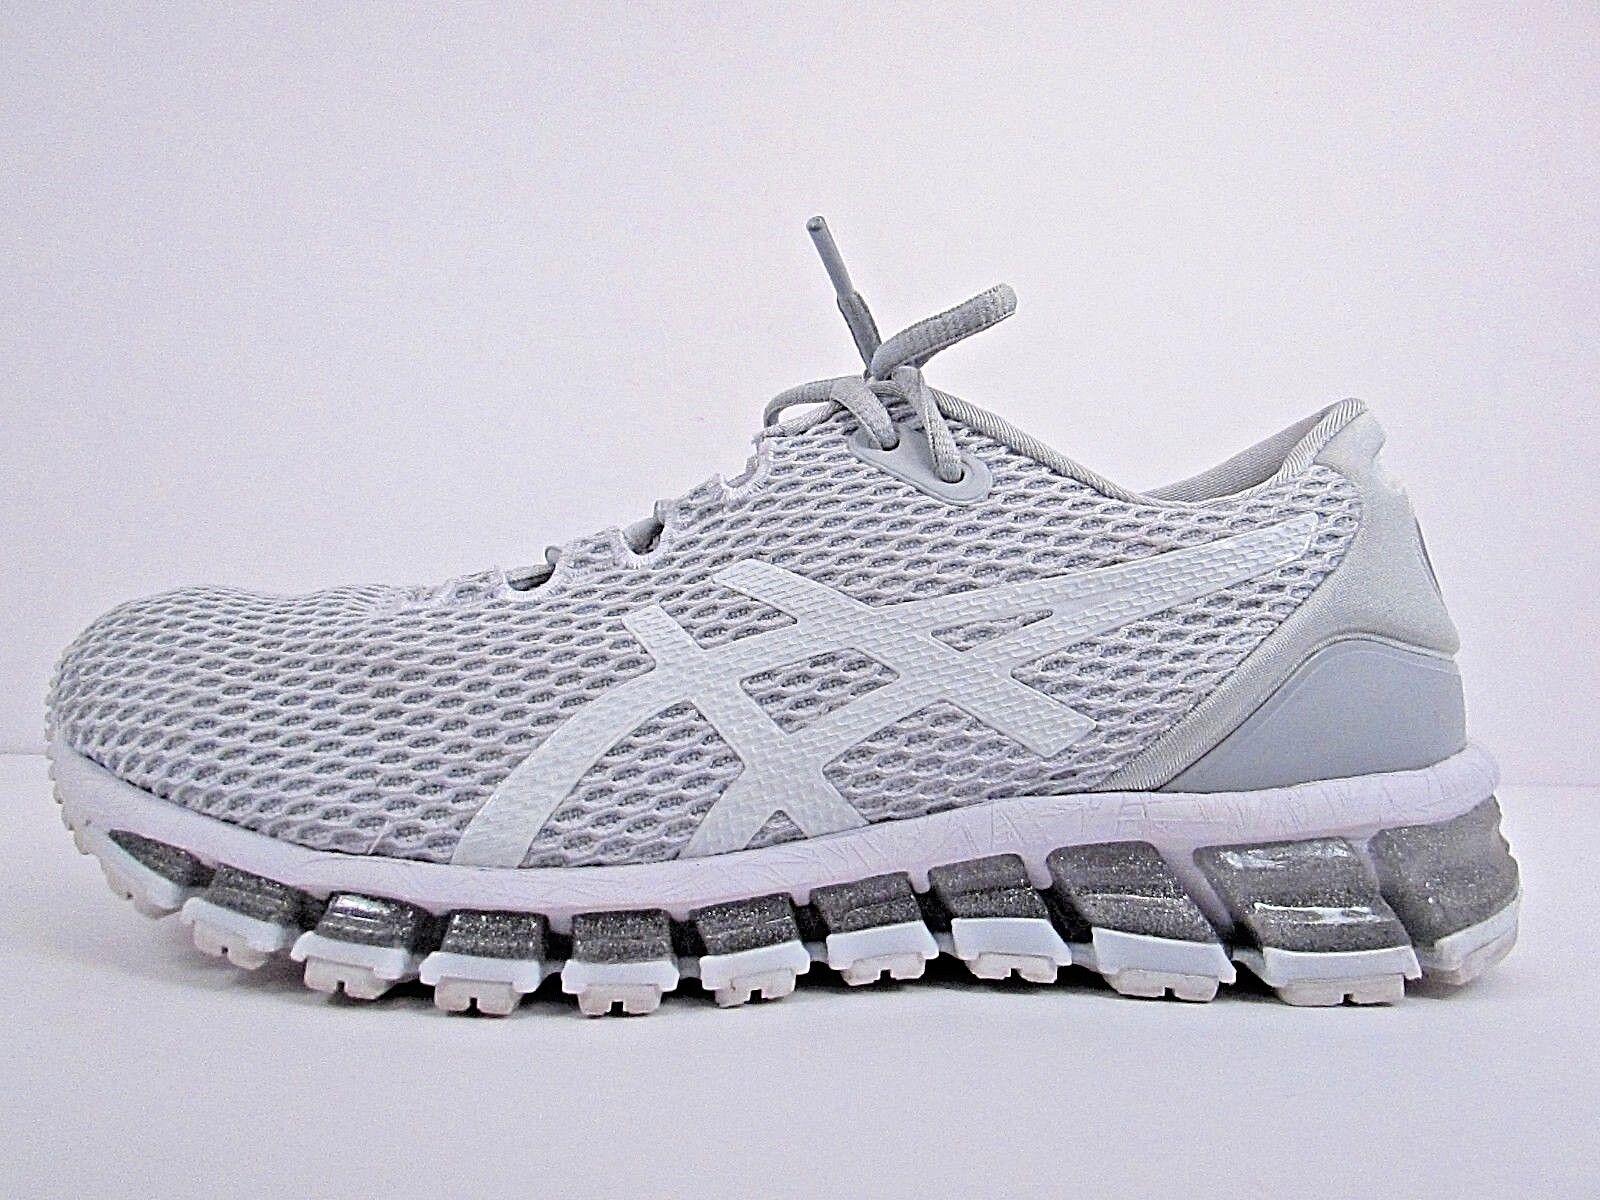 WOMEN'S ASICS GEL QUANTUM 360 SHIFT MX size 8  WORN LESS THAN 5 MILES  RUNNING